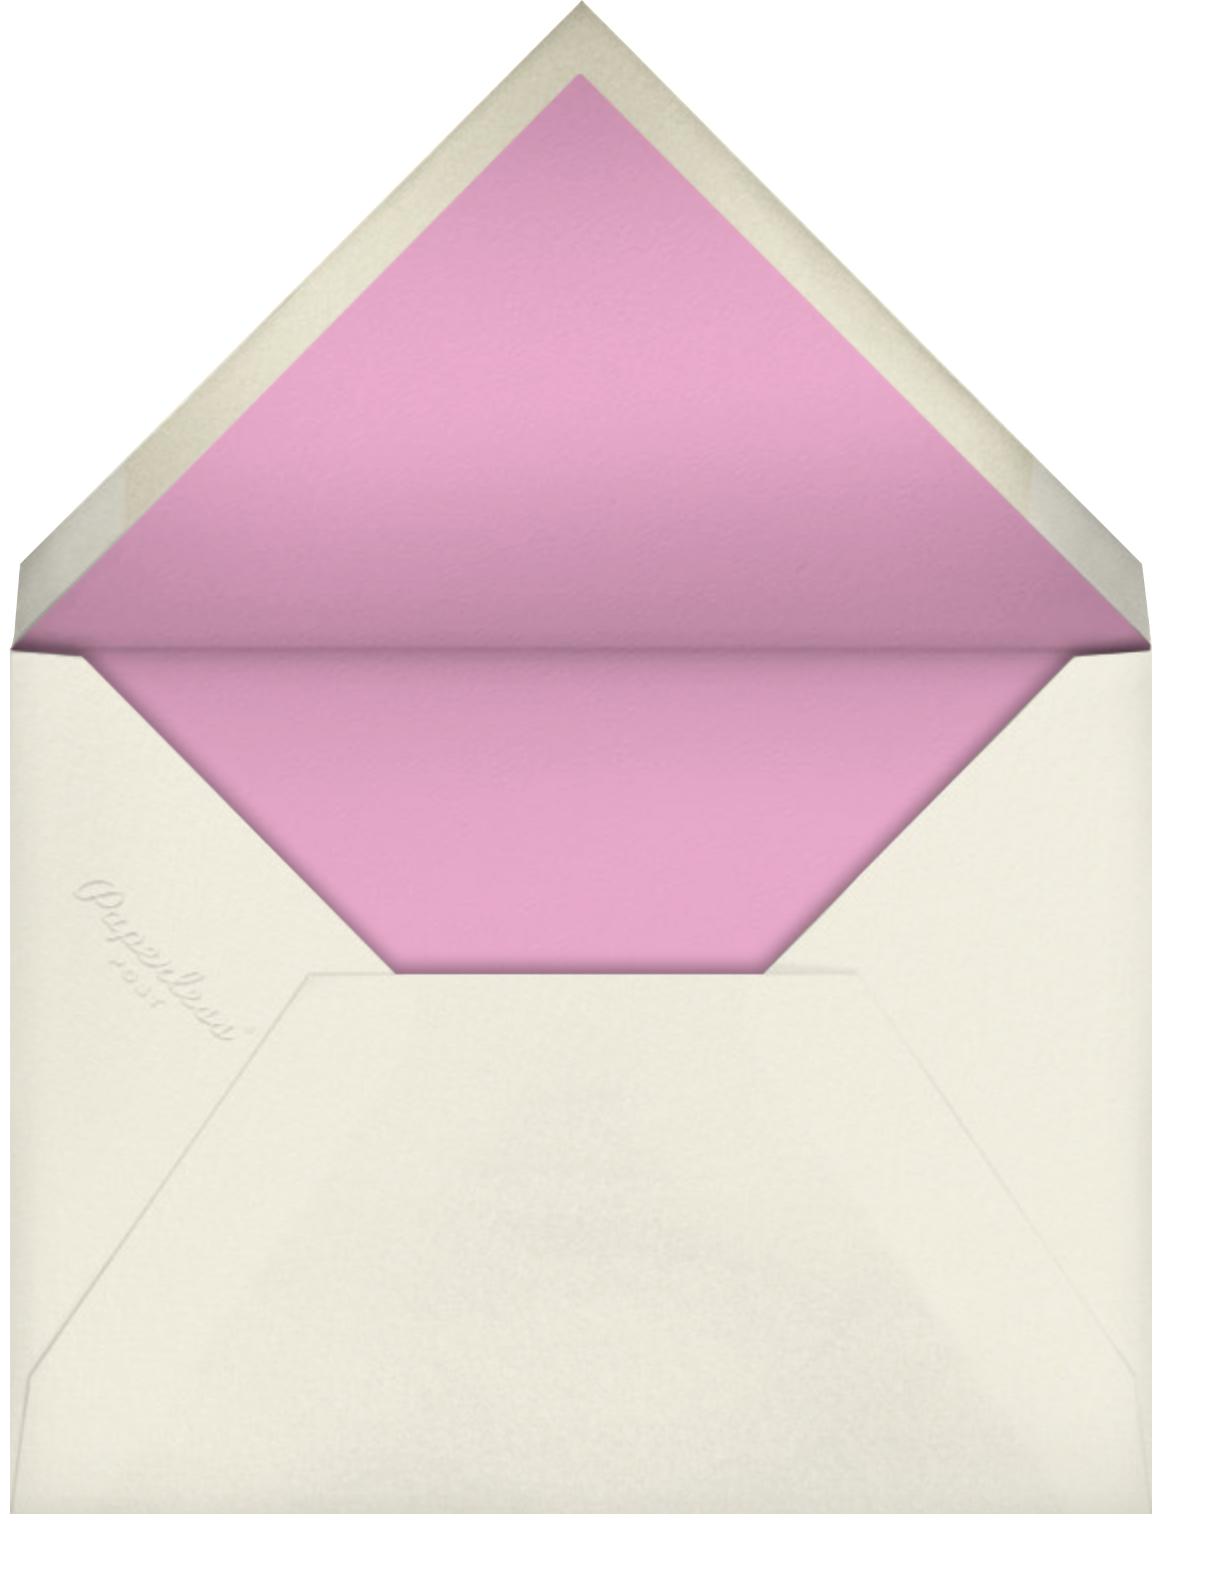 Floral Study - Oscar de la Renta - Dinner party - envelope back